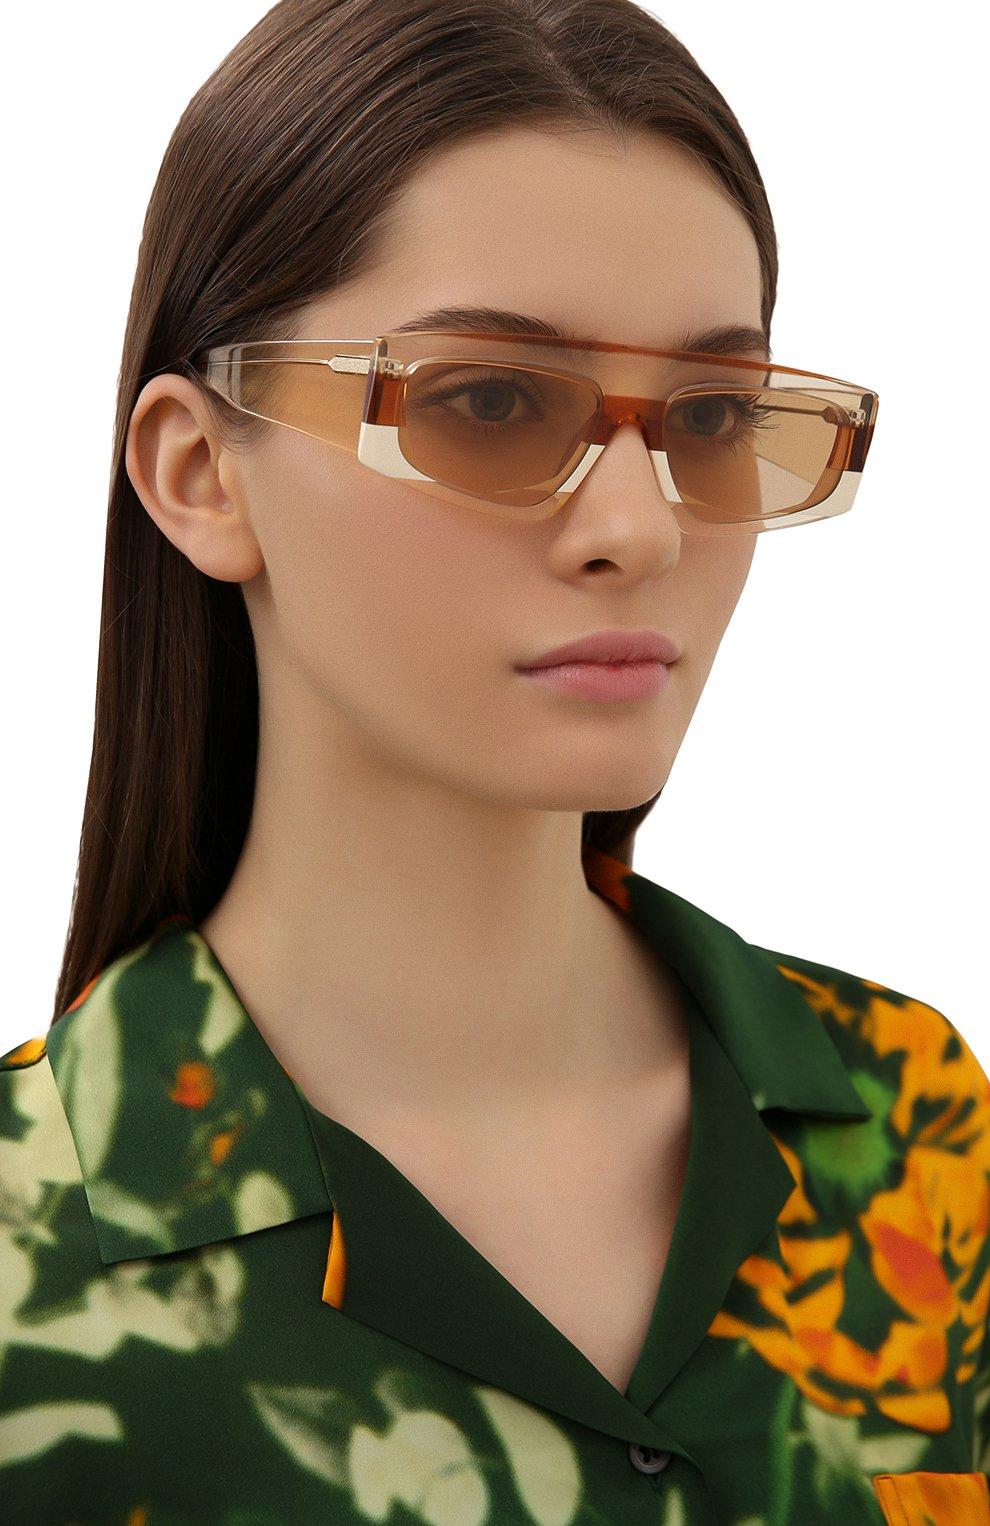 Женские солнцезащитные очки JACQUEMUS оранжевого цвета, арт. LES LUNETTES YAUC0 SHADE 0F 0RANGE | Фото 2